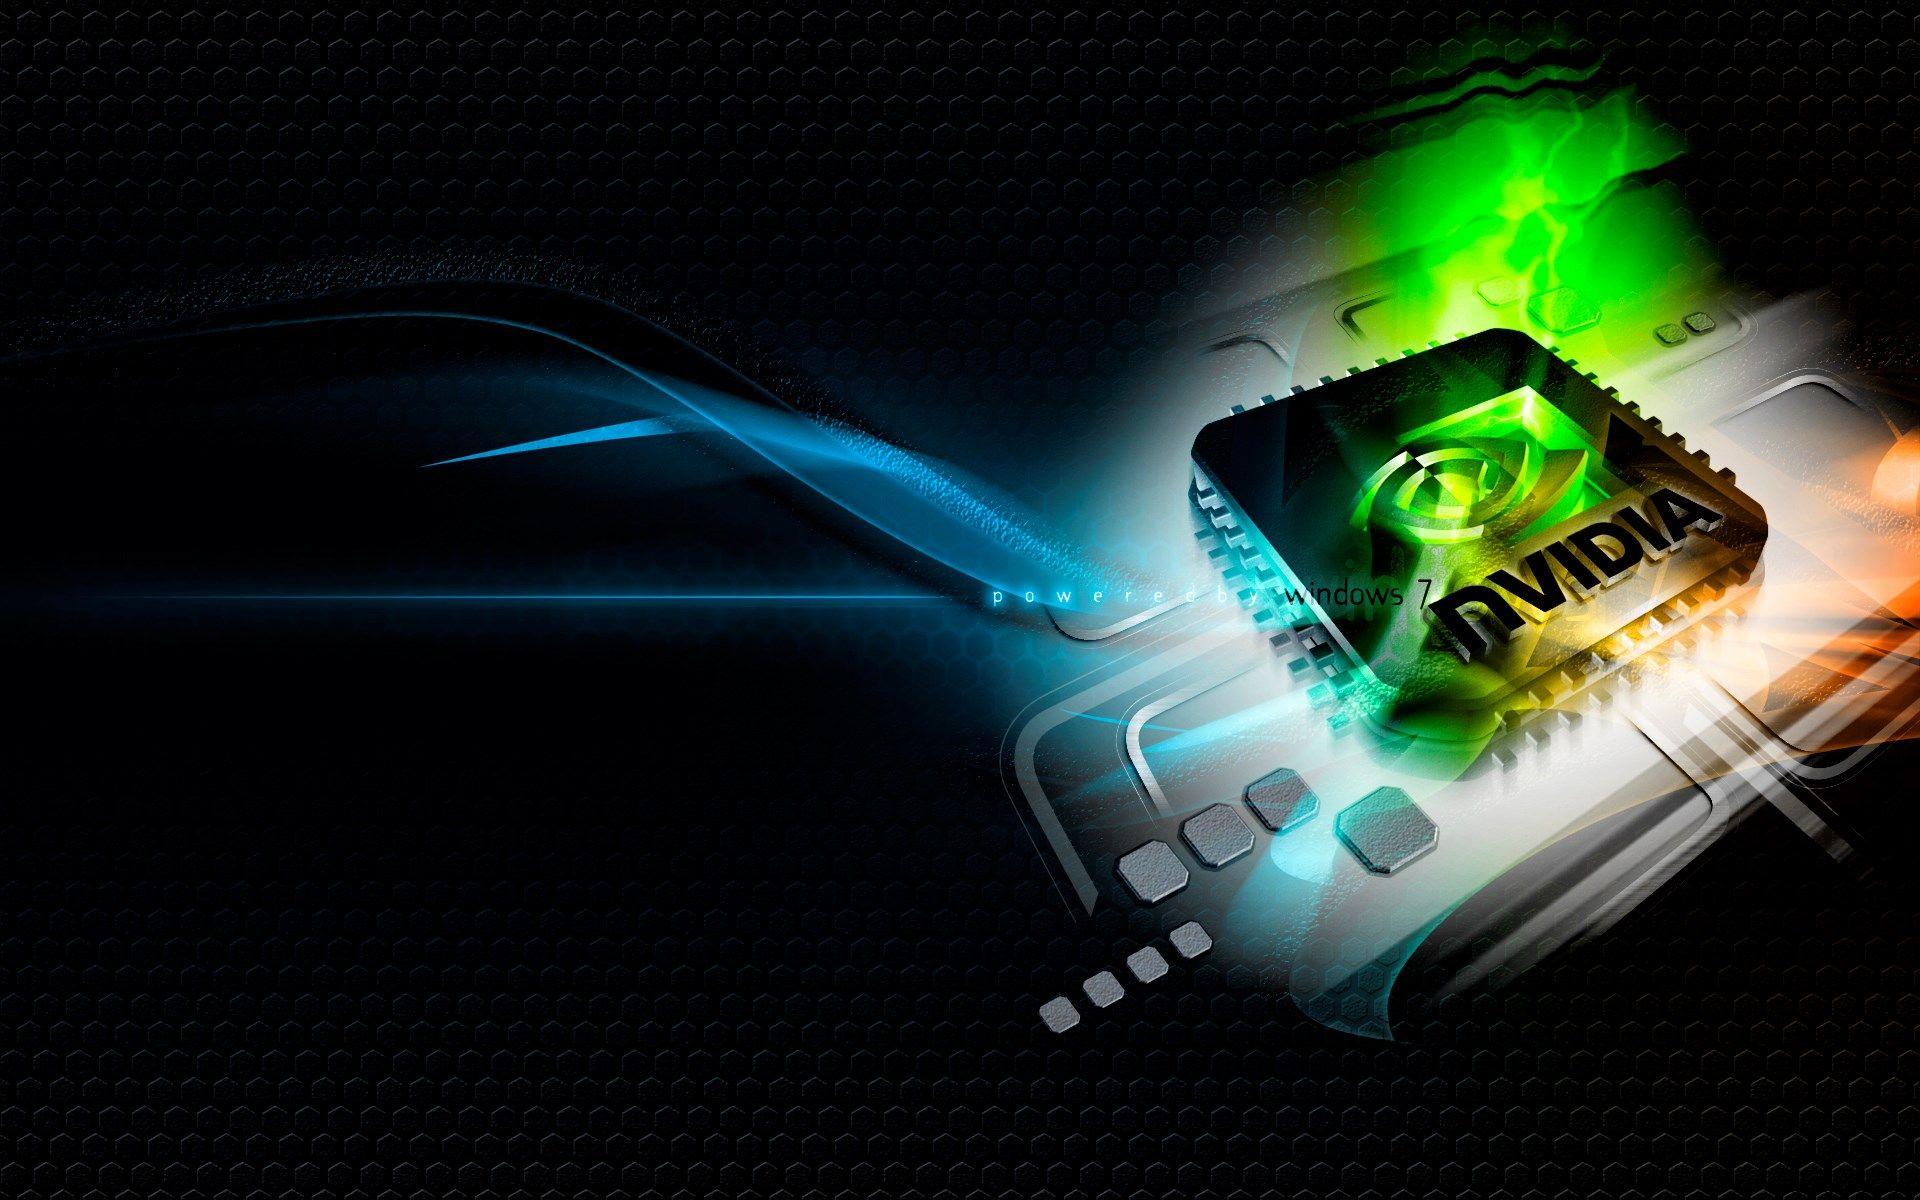 Nvidia Wallpaper Hd Backgrounds Images 1920x1200 378 Kb Seni